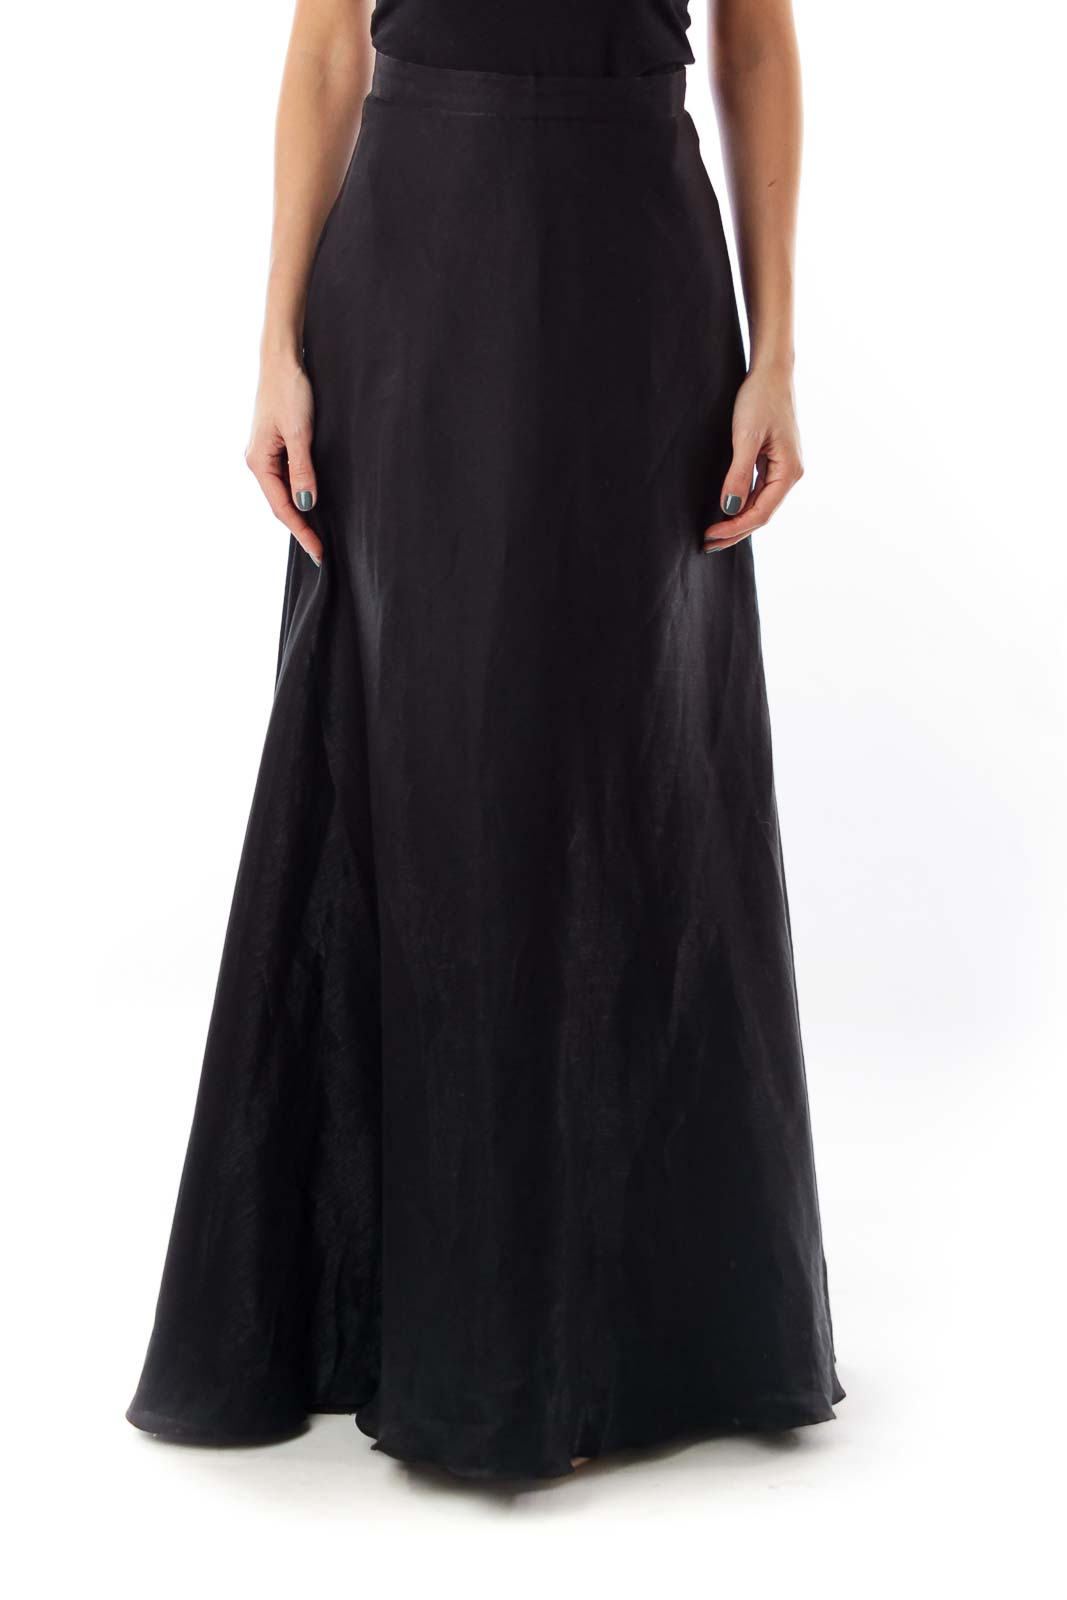 Black Long A-Line Skirt Front